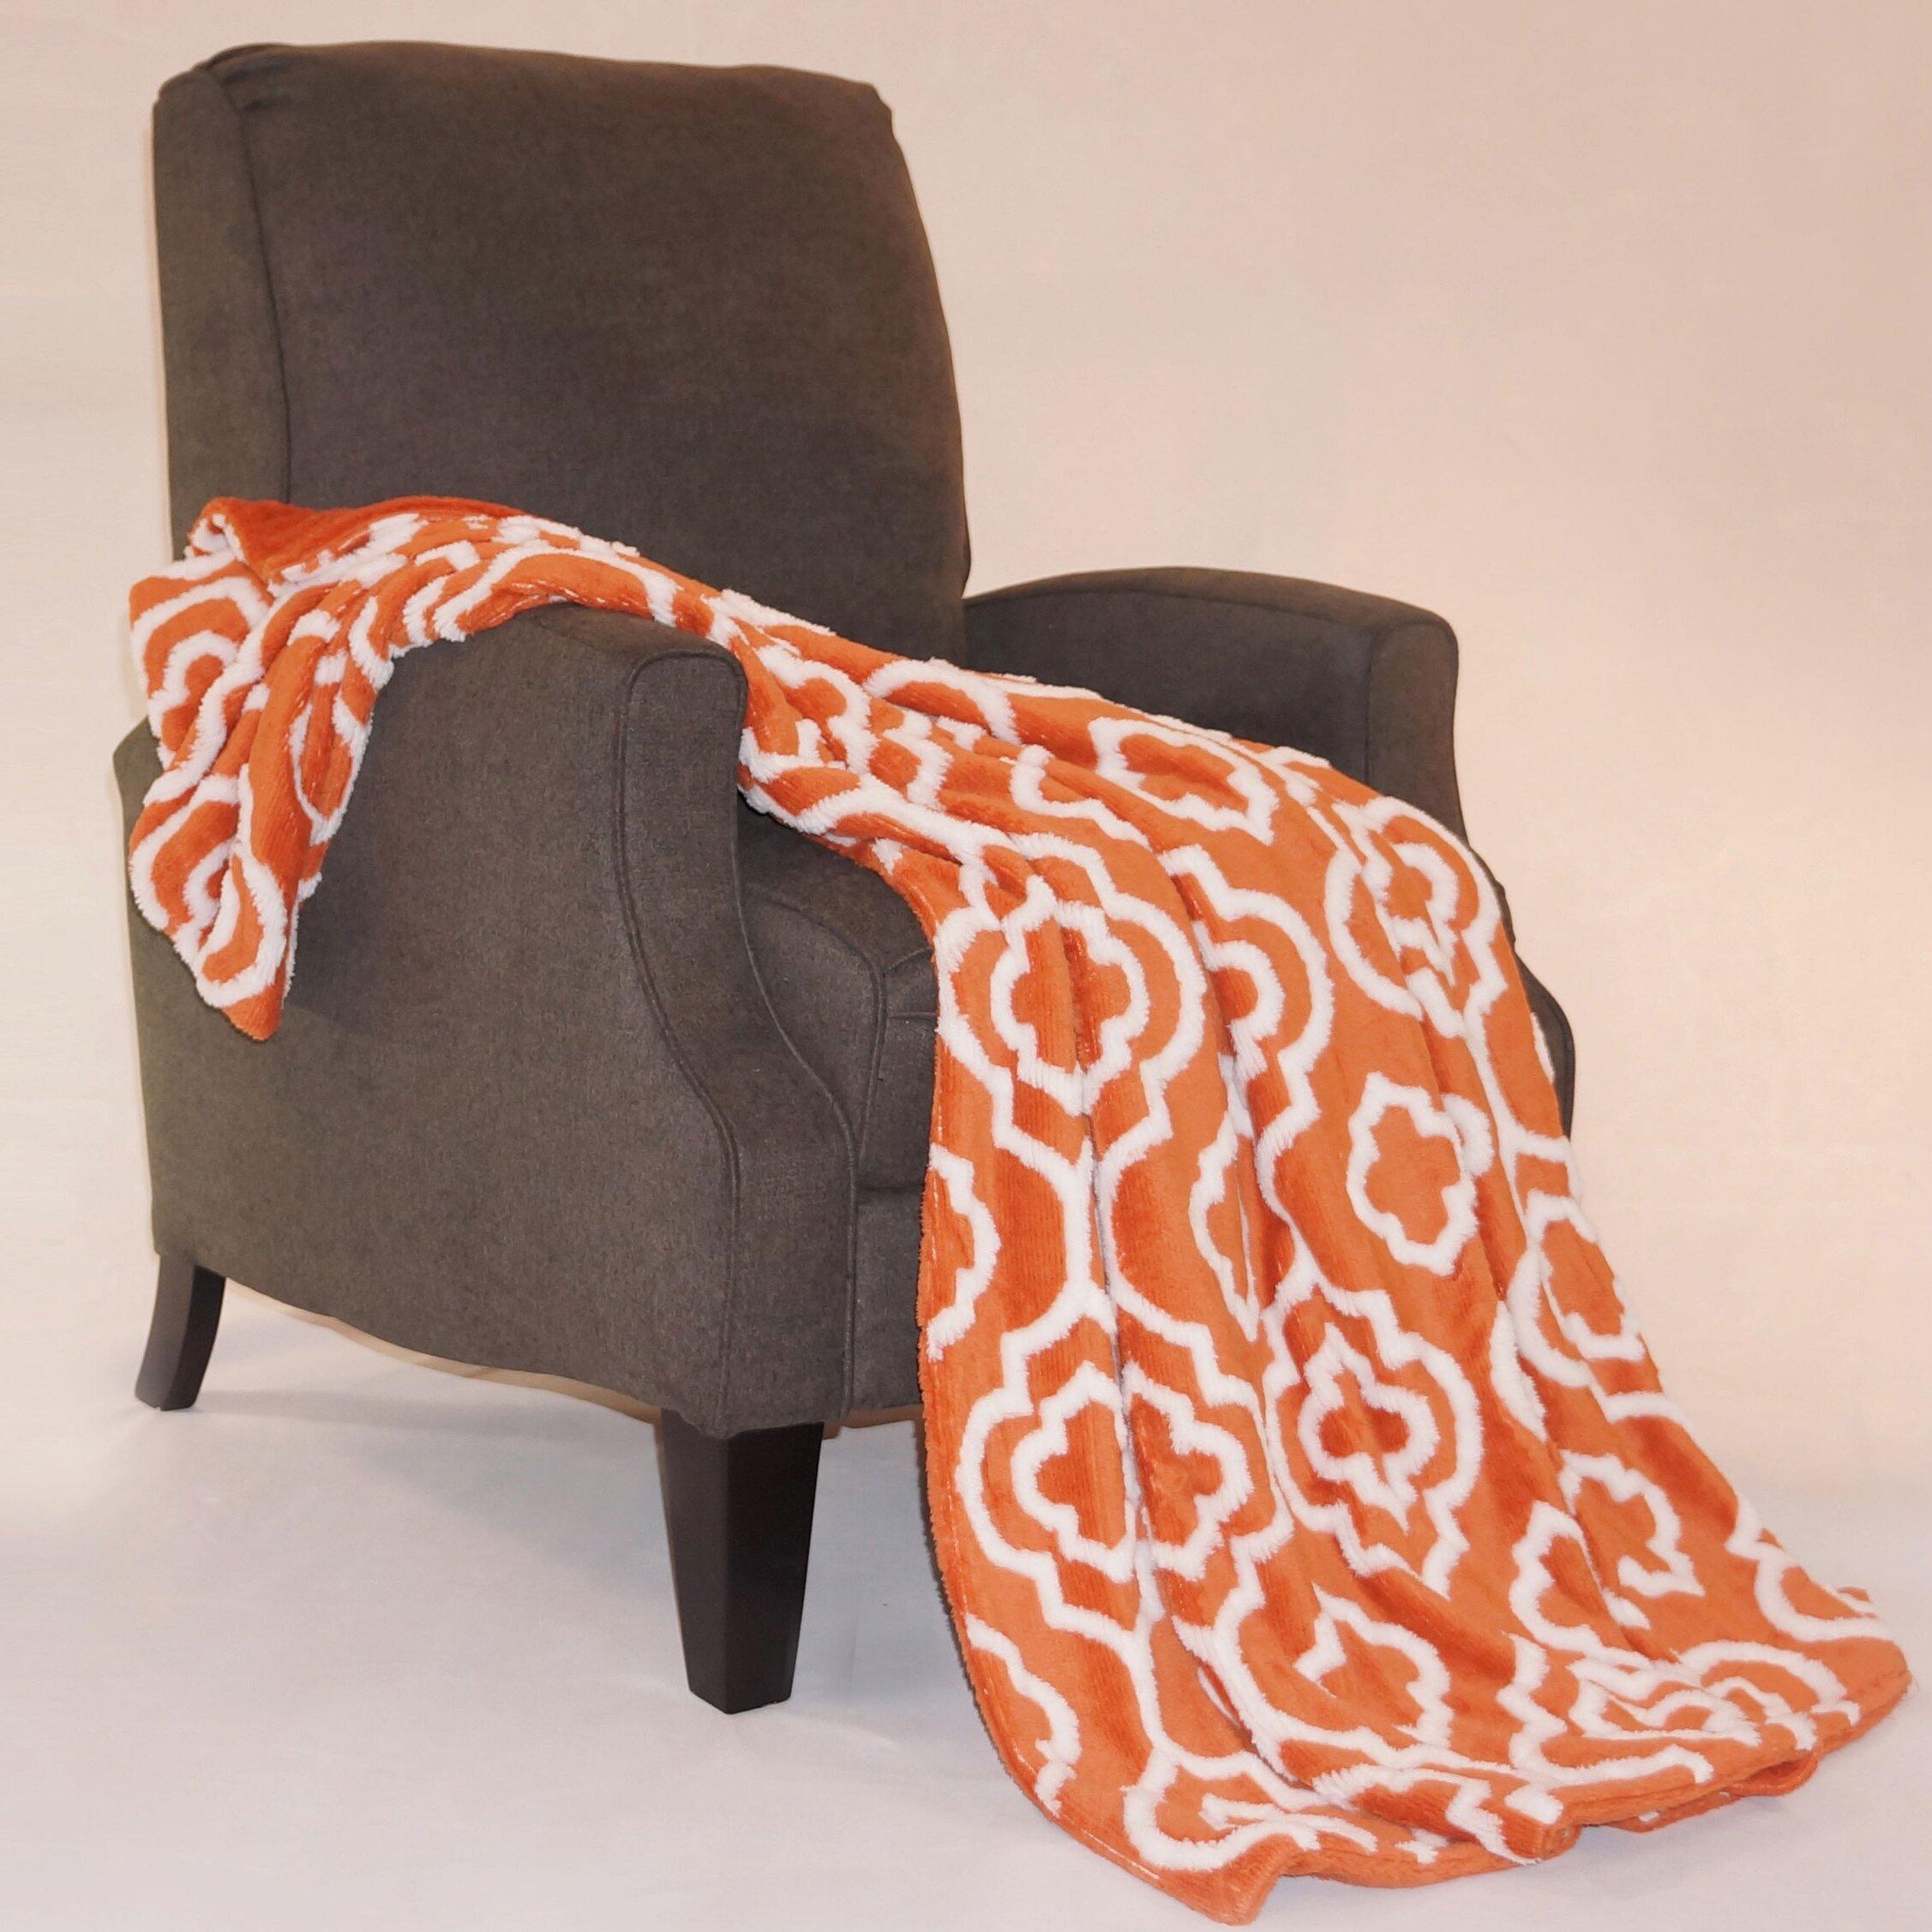 Boon Throw Blanket Jacquard Sherpa Throw Blanket